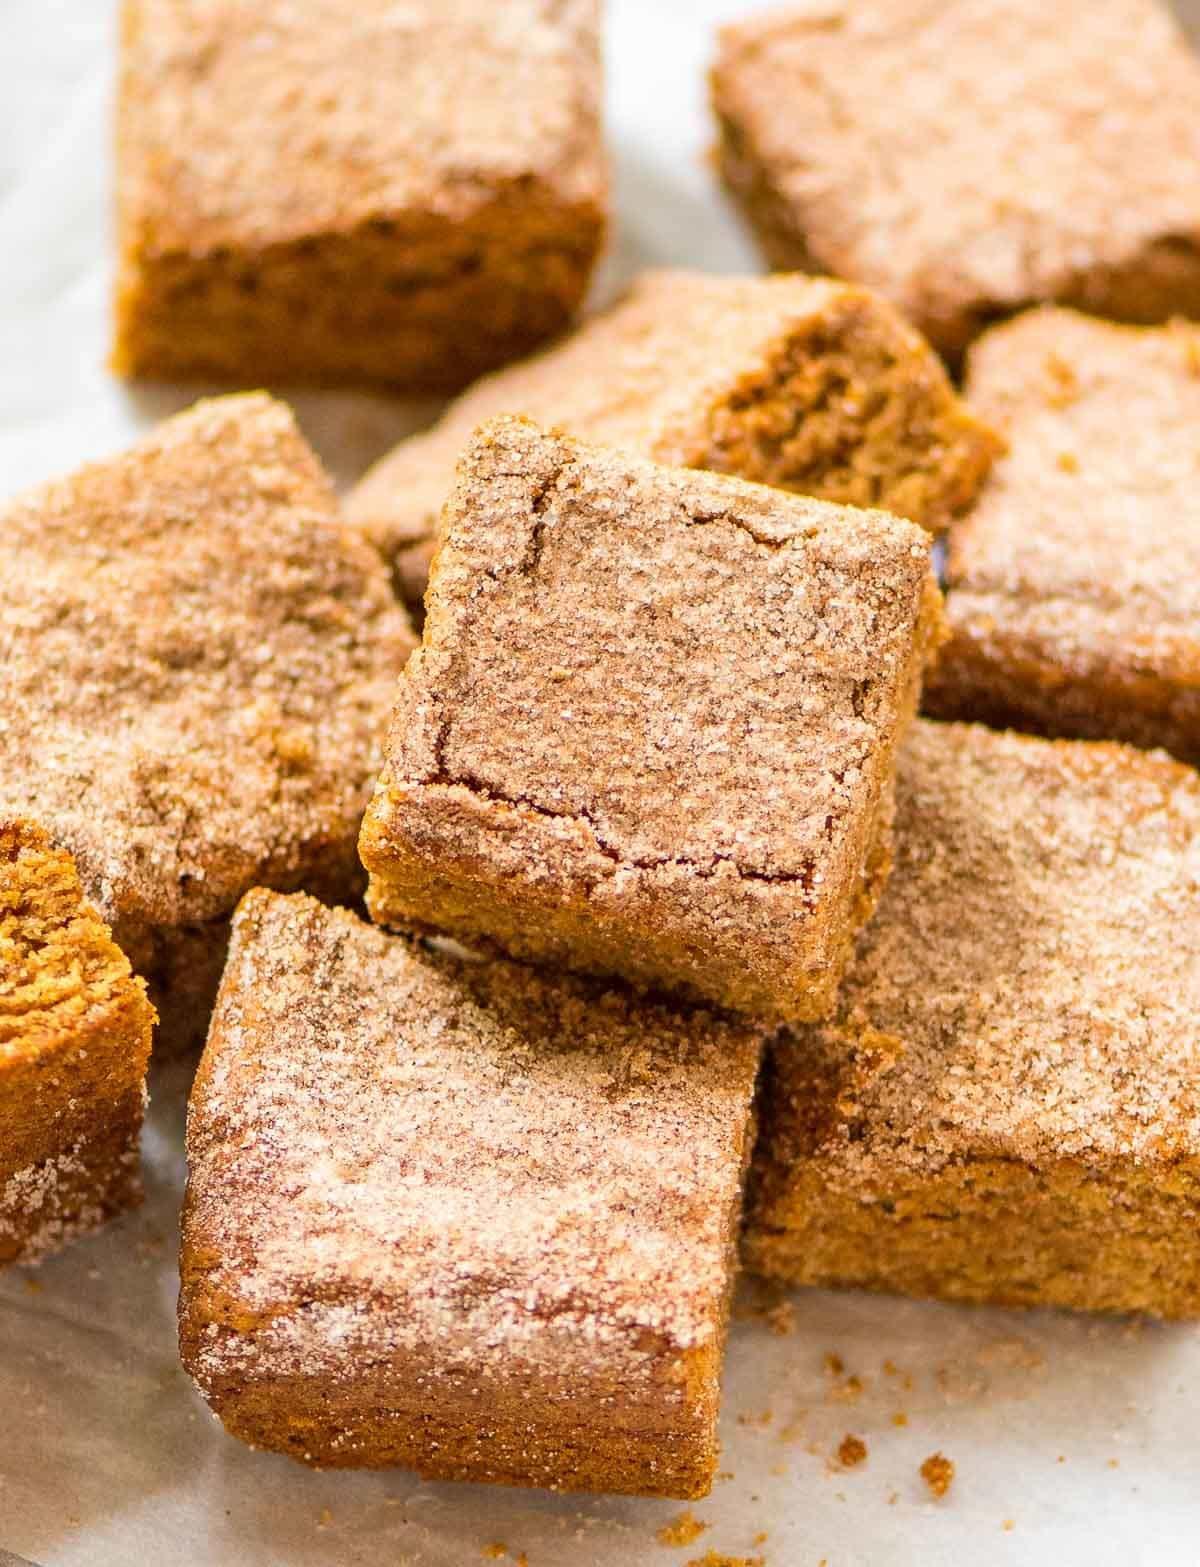 The best cinnamon blondies dessert on a plate